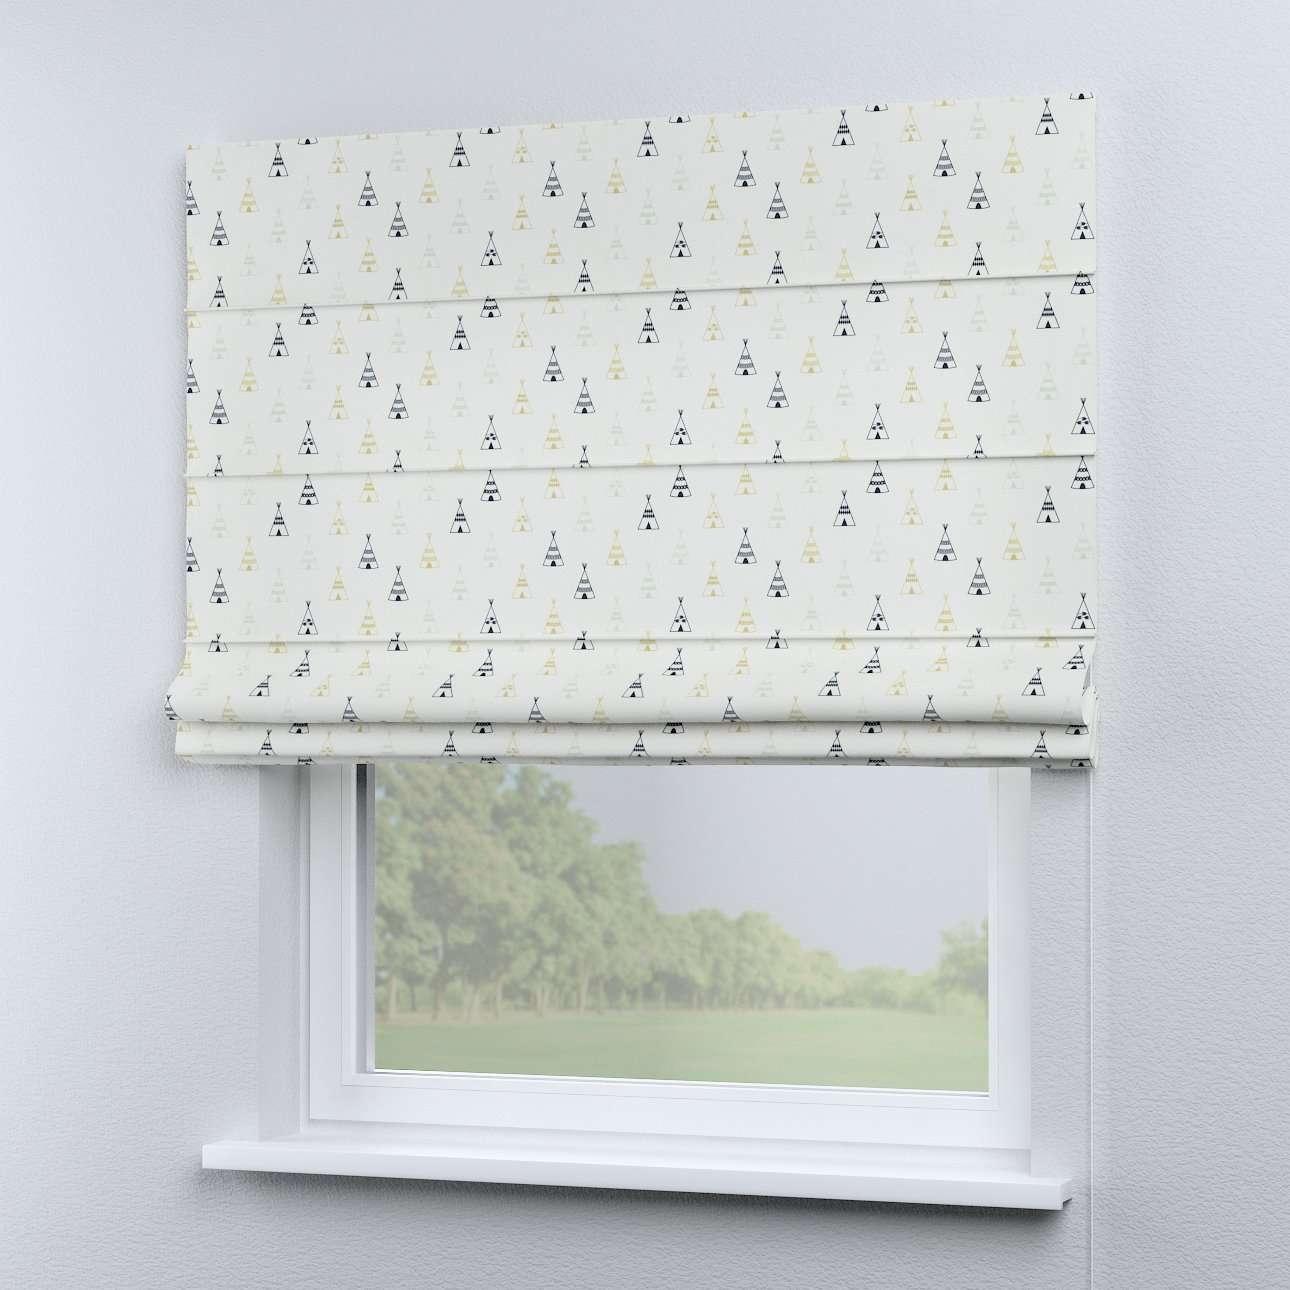 Foldegardin Capri<br/>Uden flæsekant 80 × 170 cm fra kollektionen Adventure, Stof: 141-84